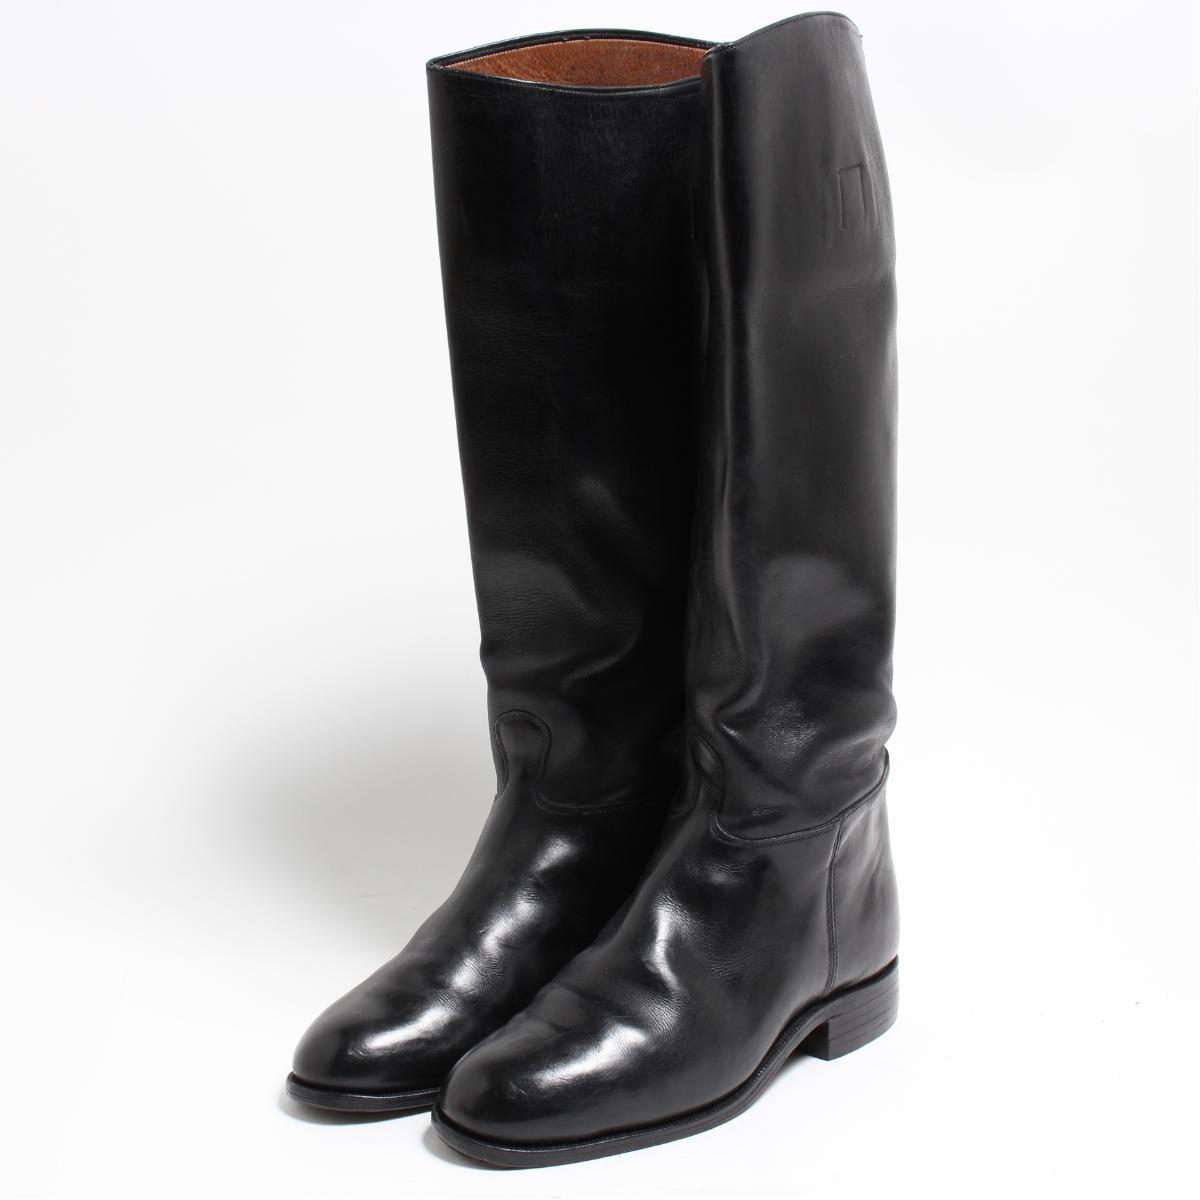 LUCHS ジョッキー乗馬ブーツ 4.5 レディース22.5cm /bon6099 【中古】 【180915】